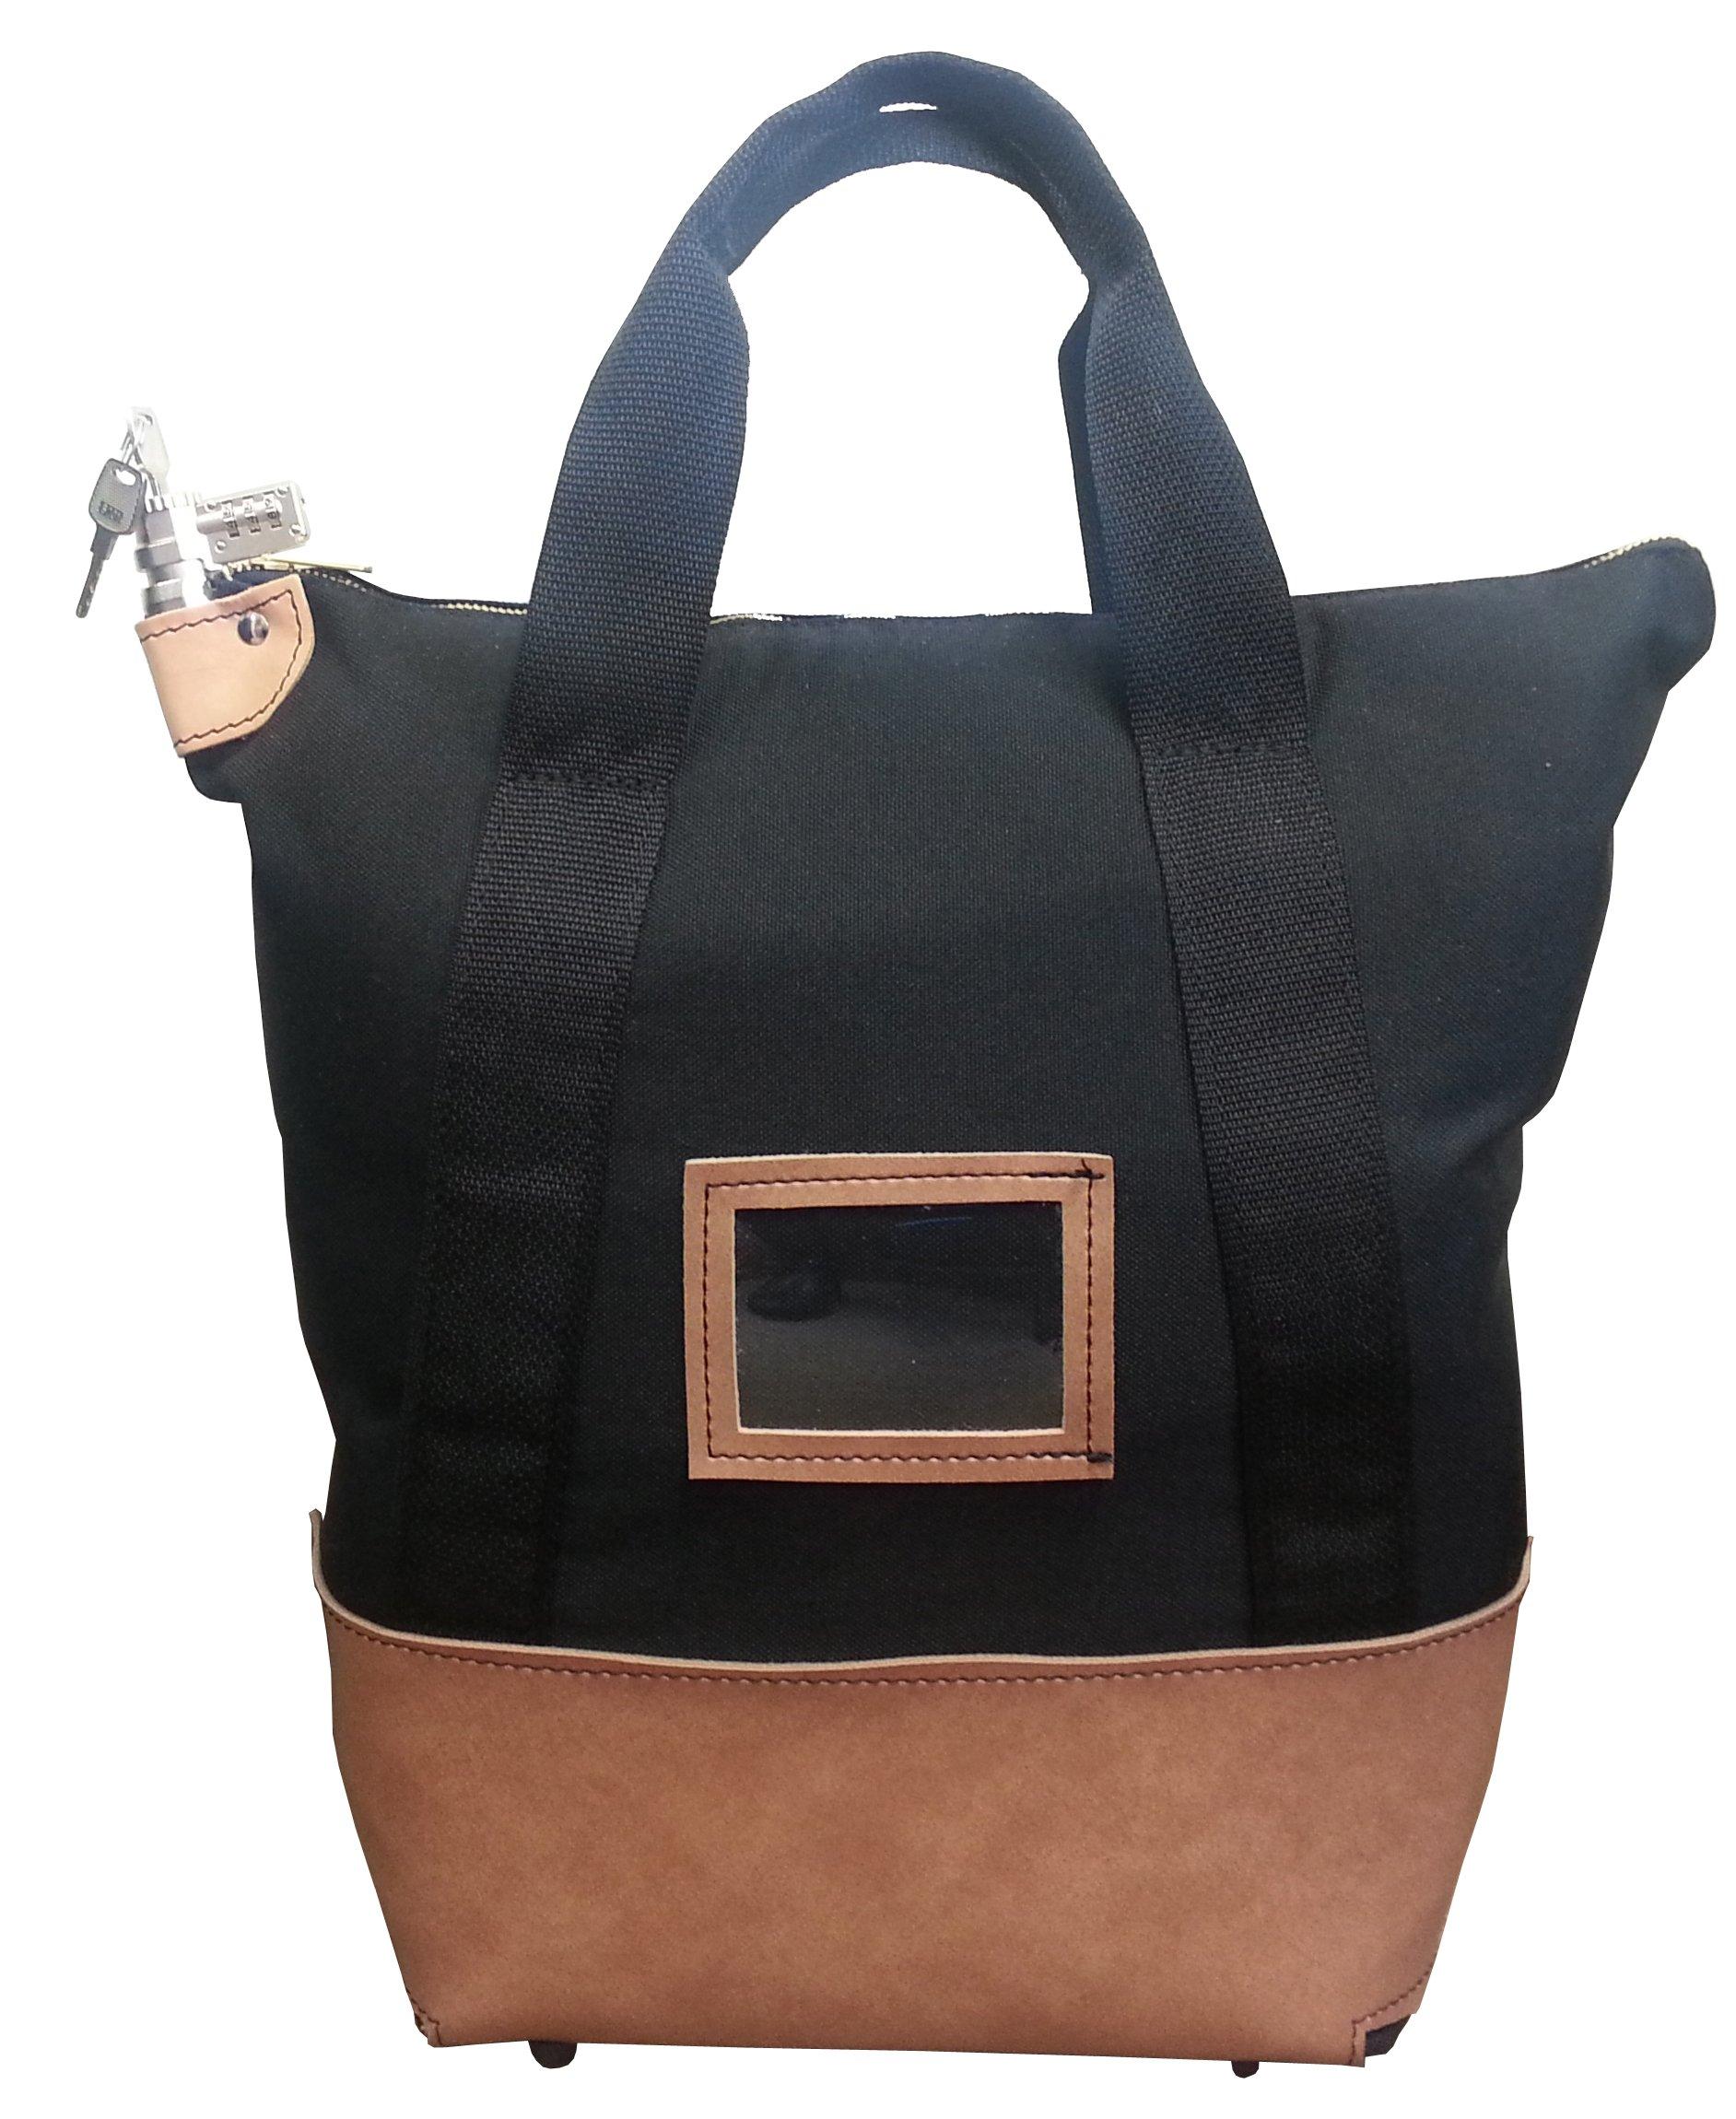 Locking Courier Bag 1000 Denier Nylon Combination Lock Black by Cardinal Bag Supplies (Image #5)